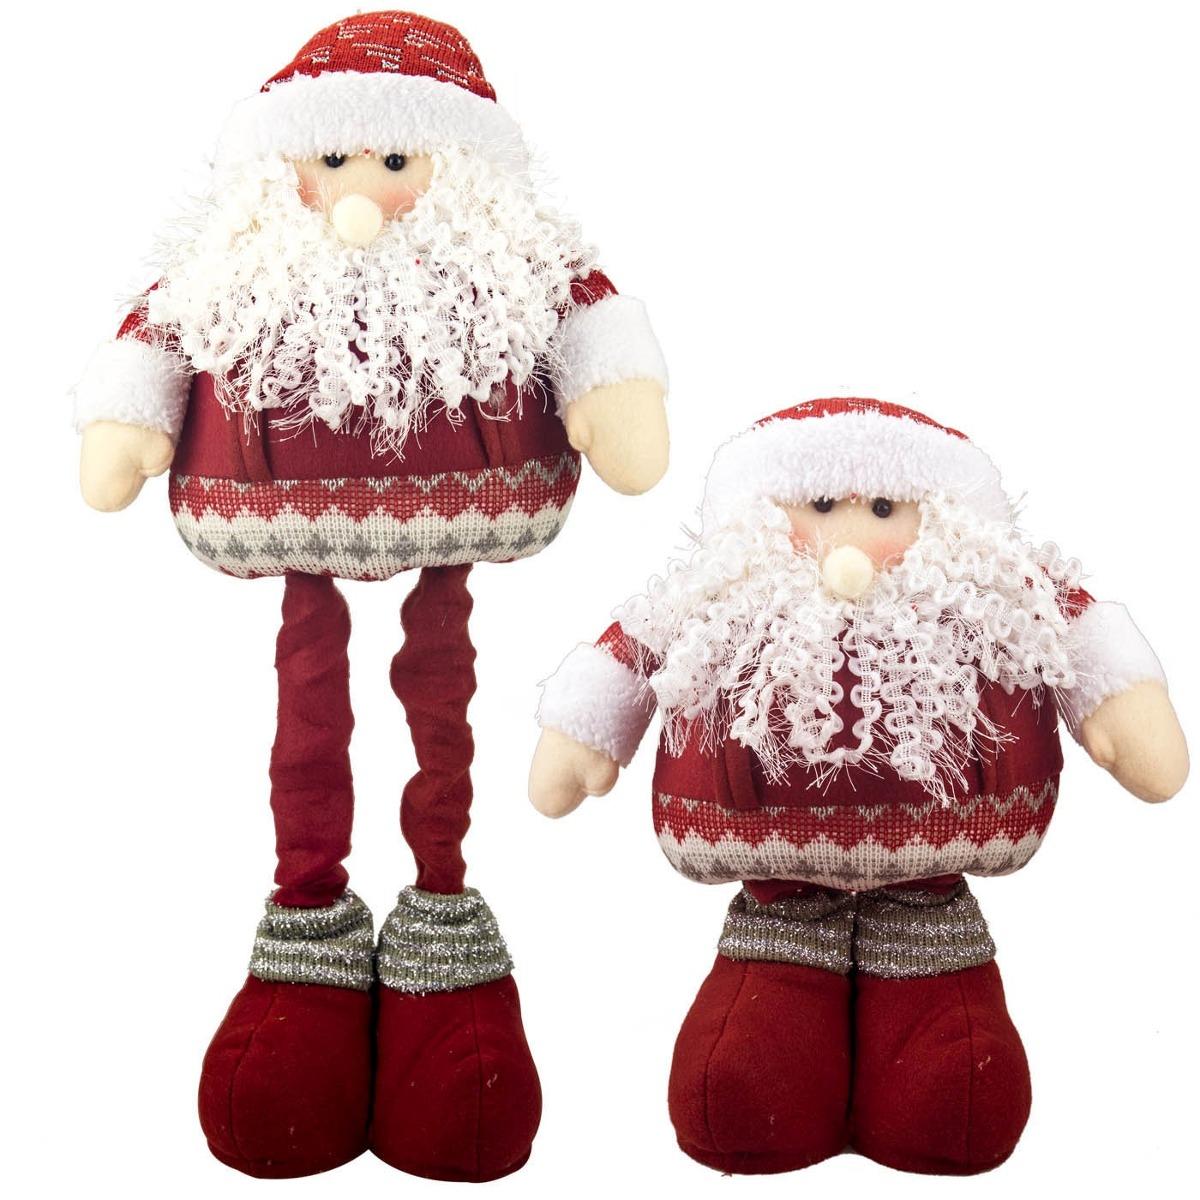 Kit Com 3 Papai Noel 1624a Natal 50cm Pernas Telescópicas R 239